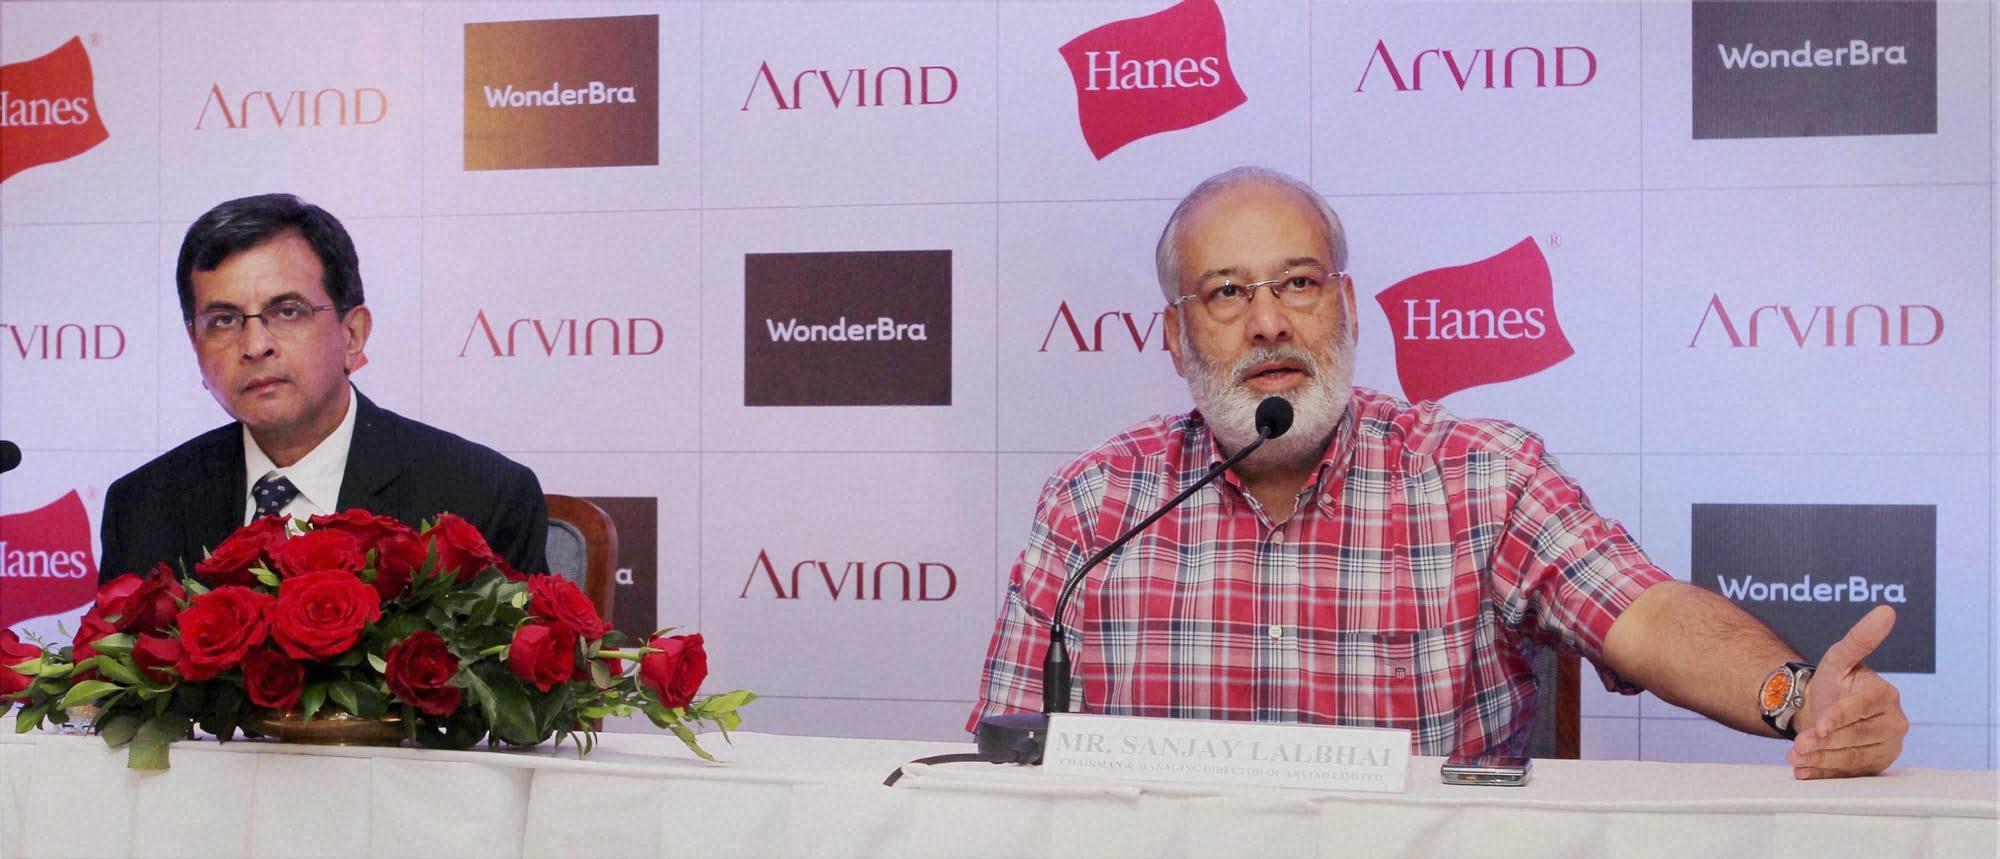 Arvind Lifestyle Brands, Sanjay Lalbhai, J Suresh